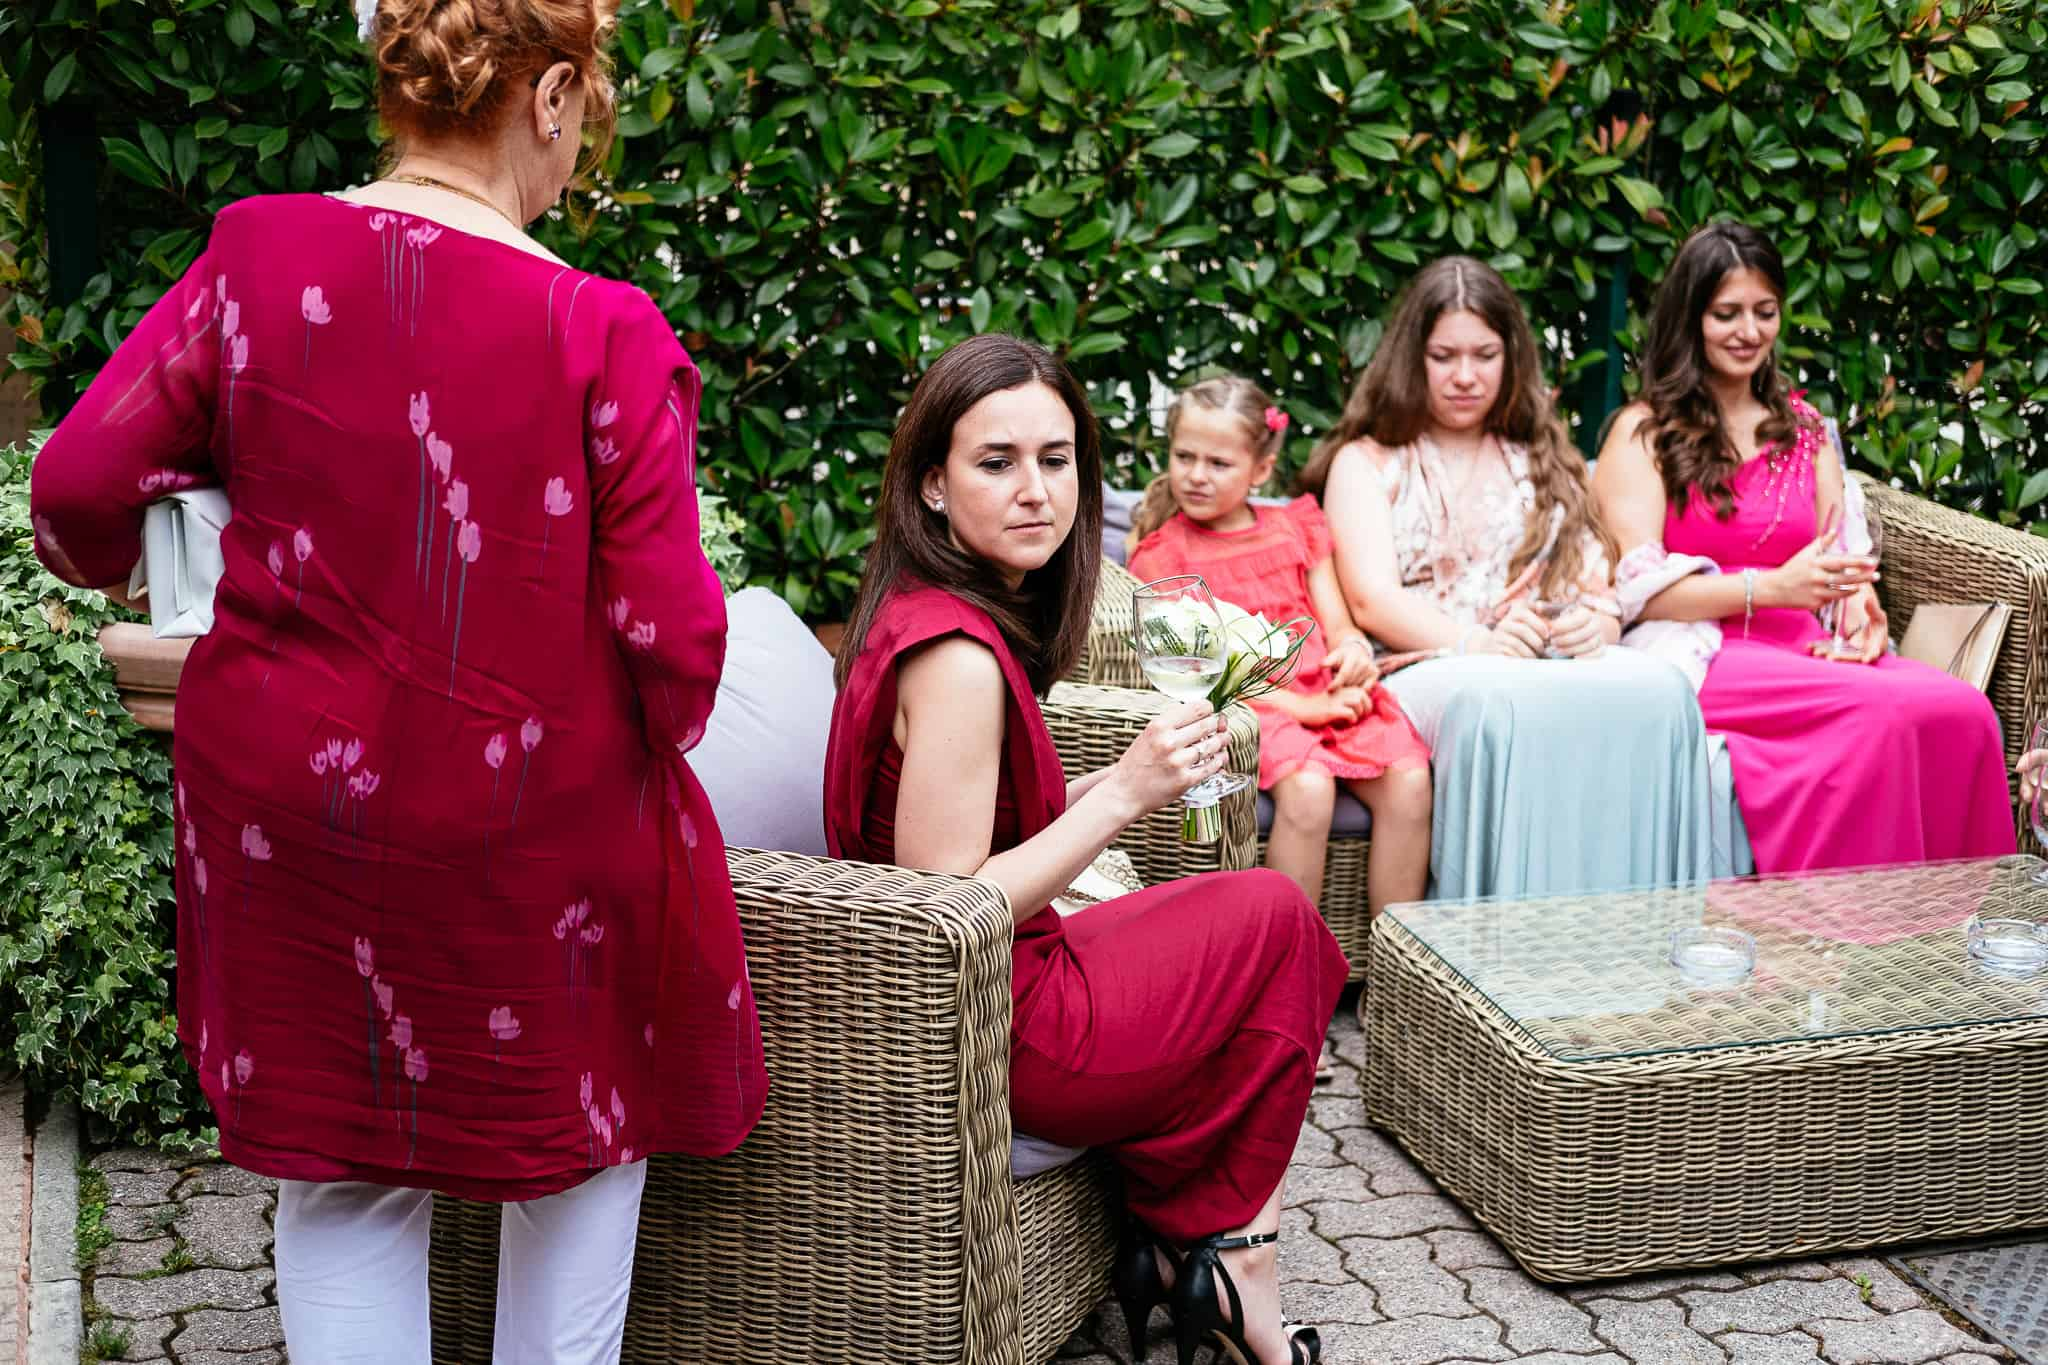 matrimonio Canter Milano San siro Luca rossi wedding reportage 0032